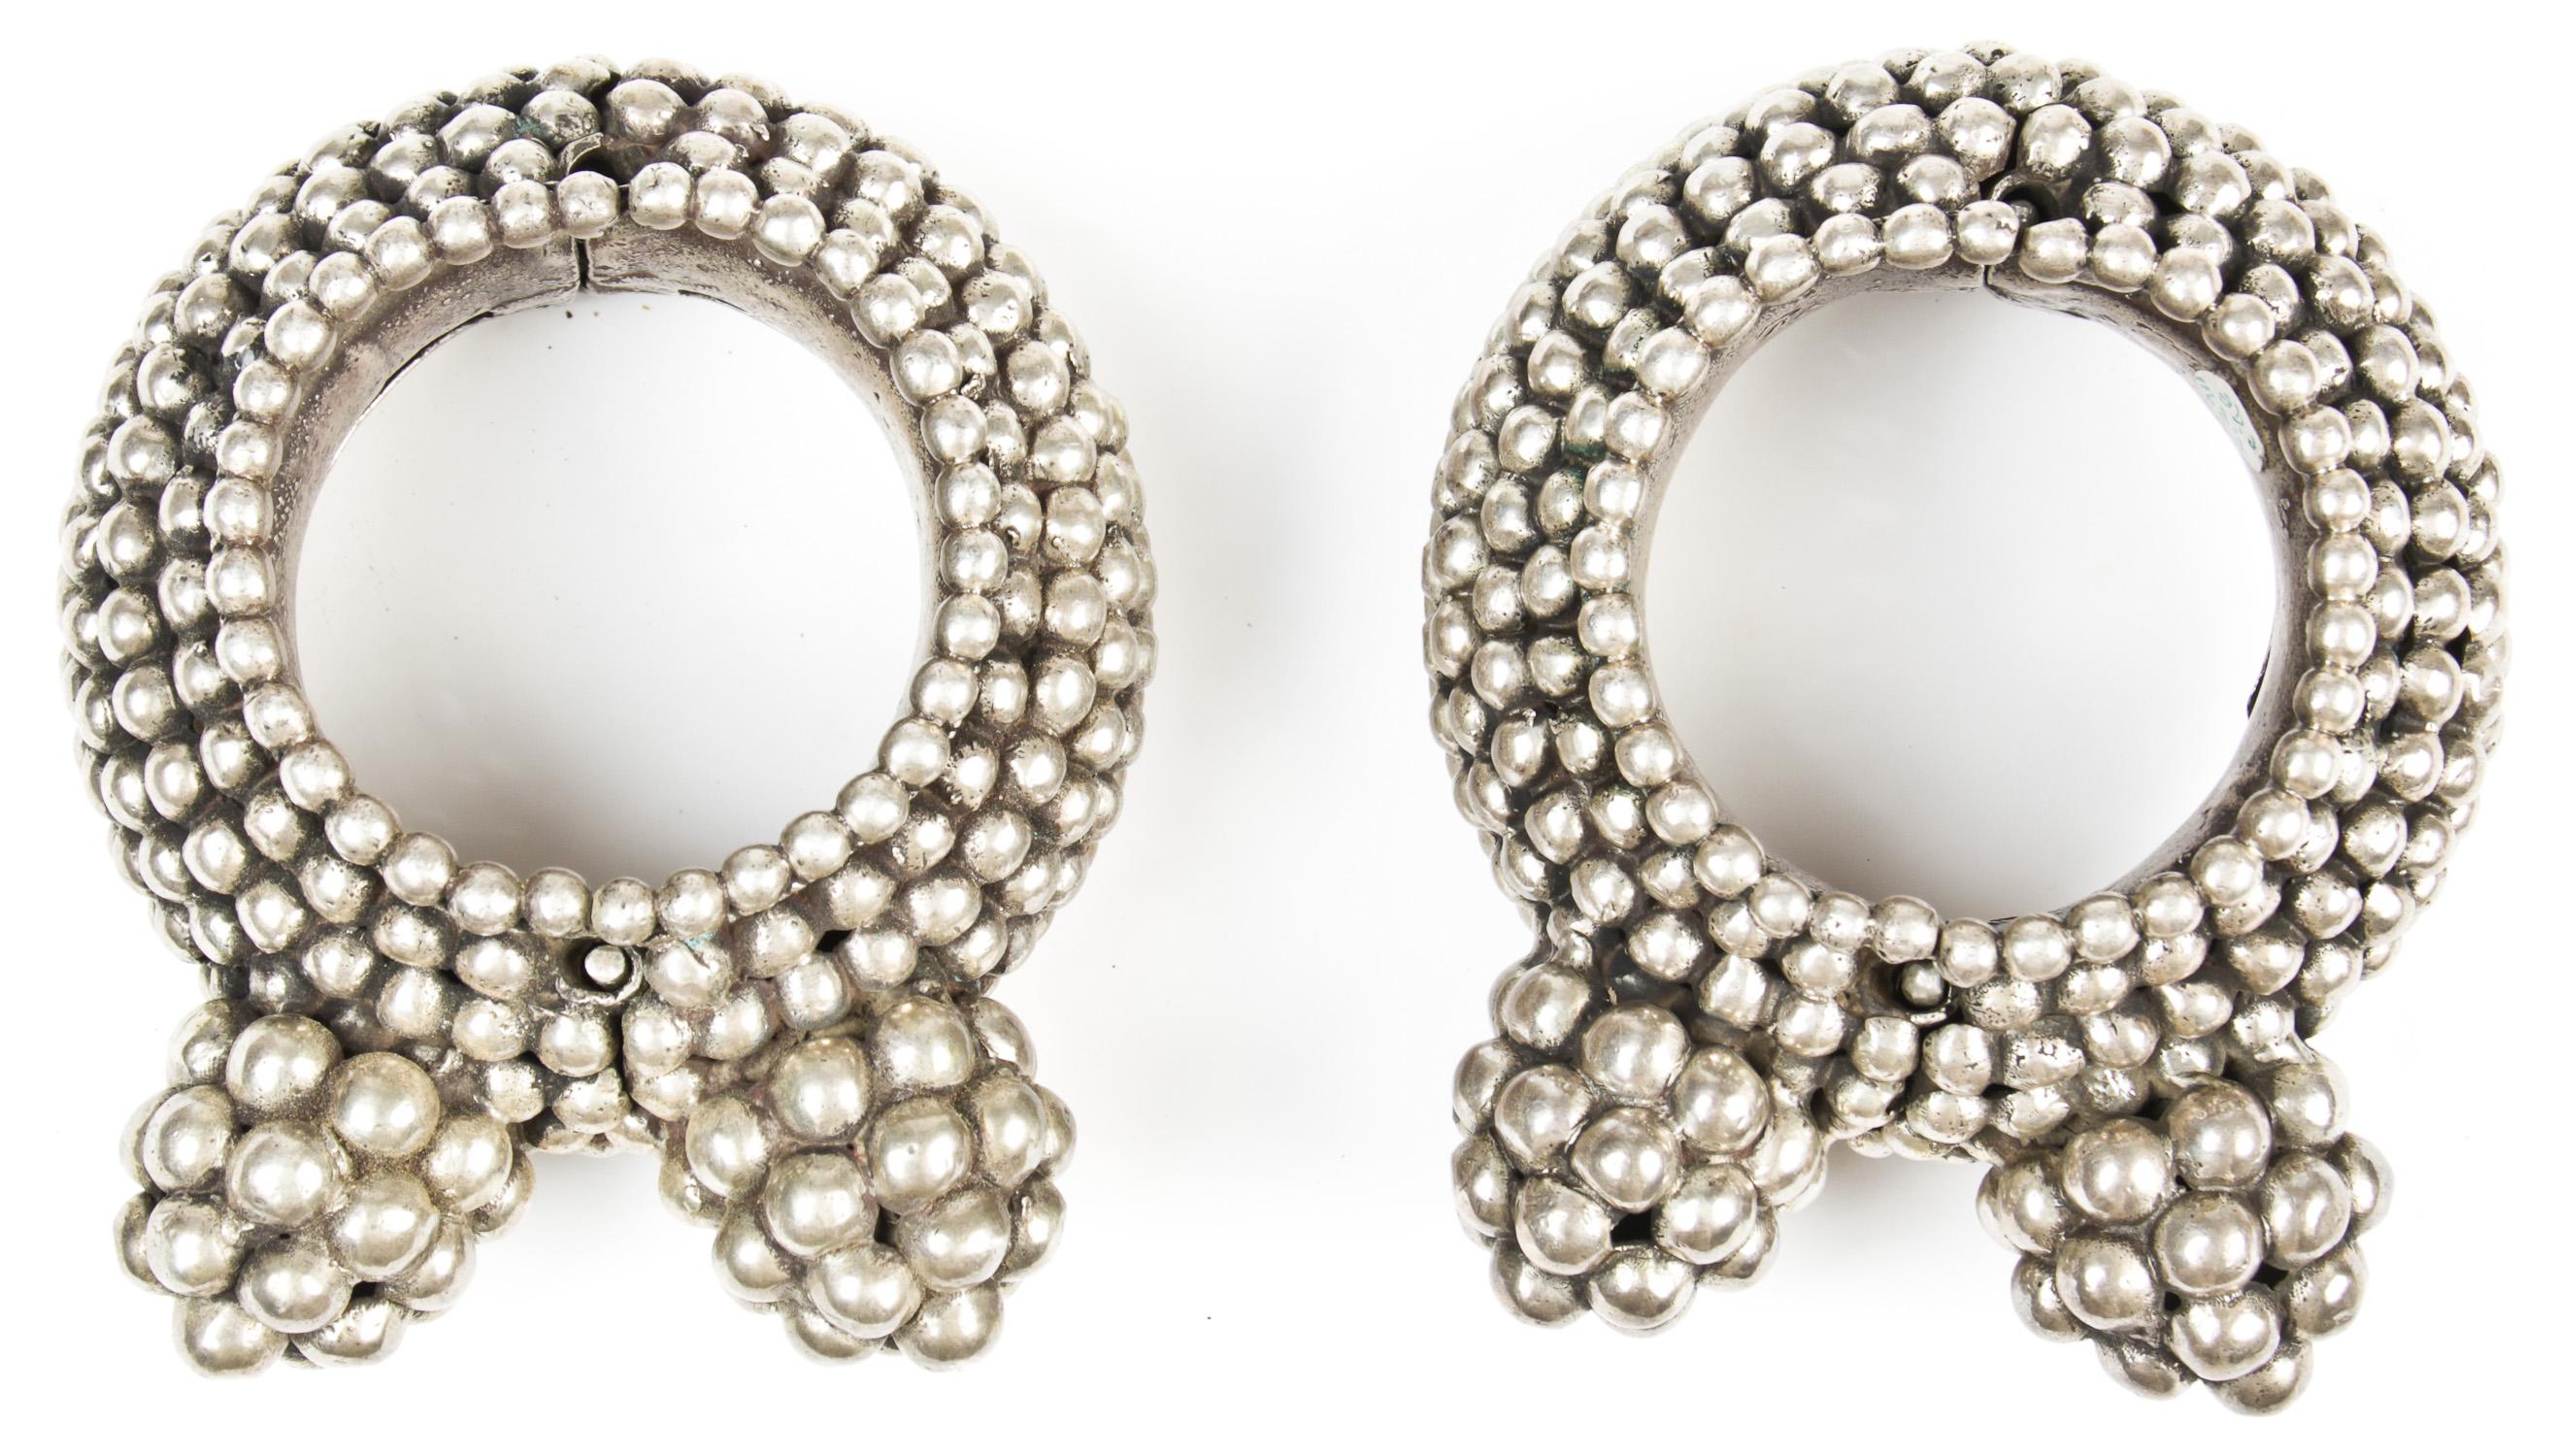 Lot 576  Pair East Indian Ankle Bracelets Each Size: 25